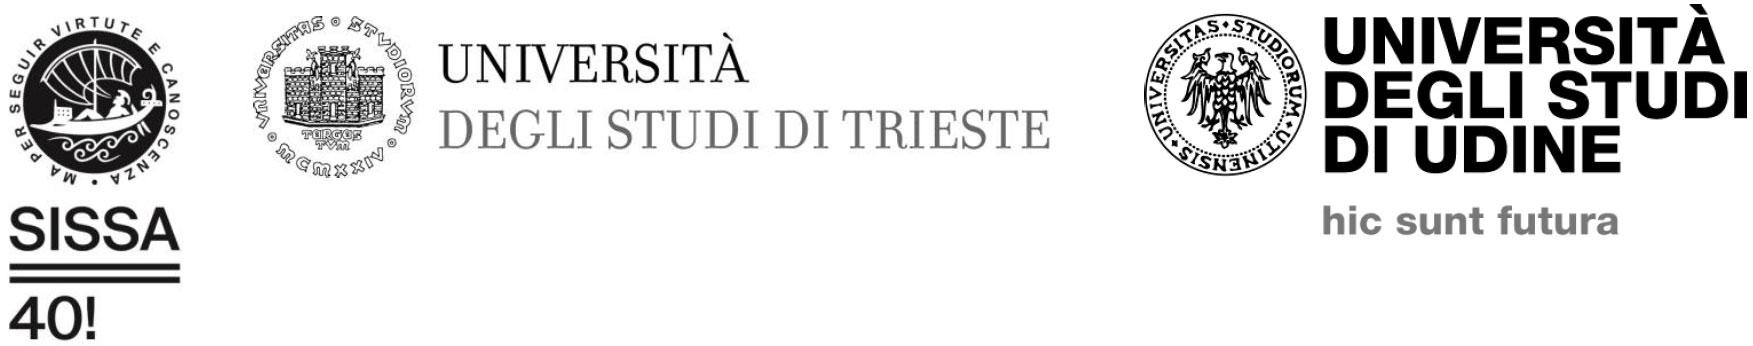 Sissa Università di Trieste Università di Udine